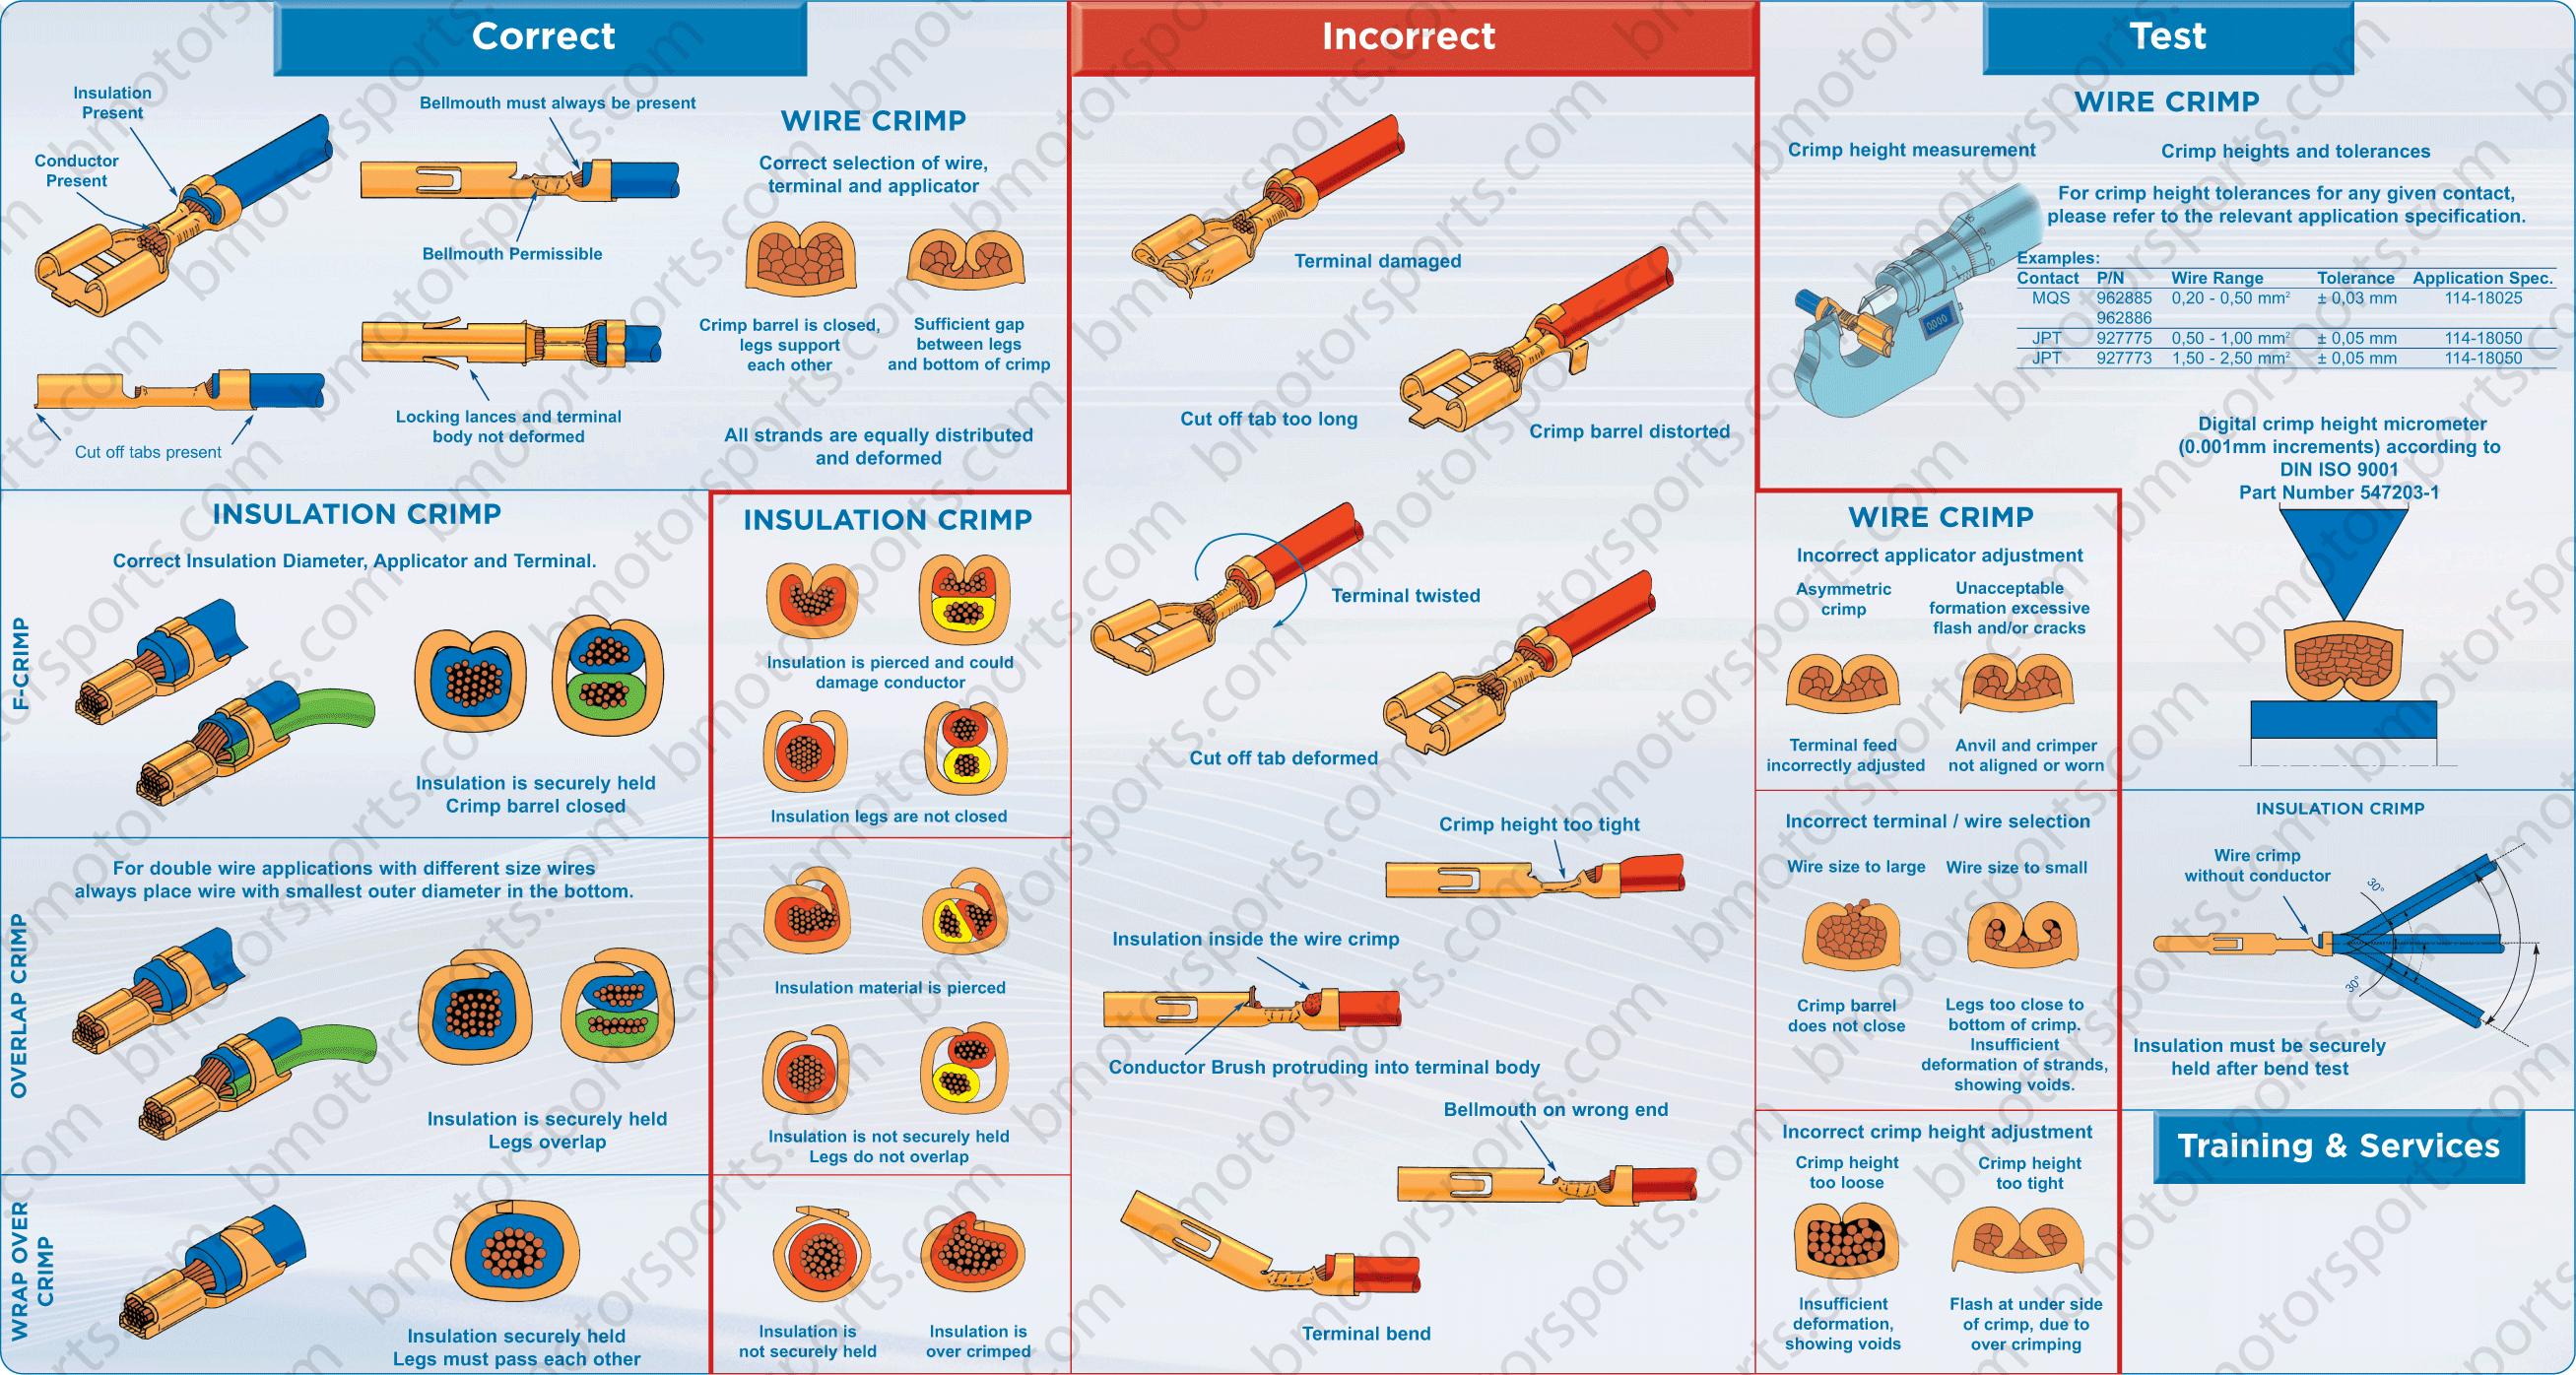 wire crimp size chart | Wireless Sensor | Pinterest | Crimping